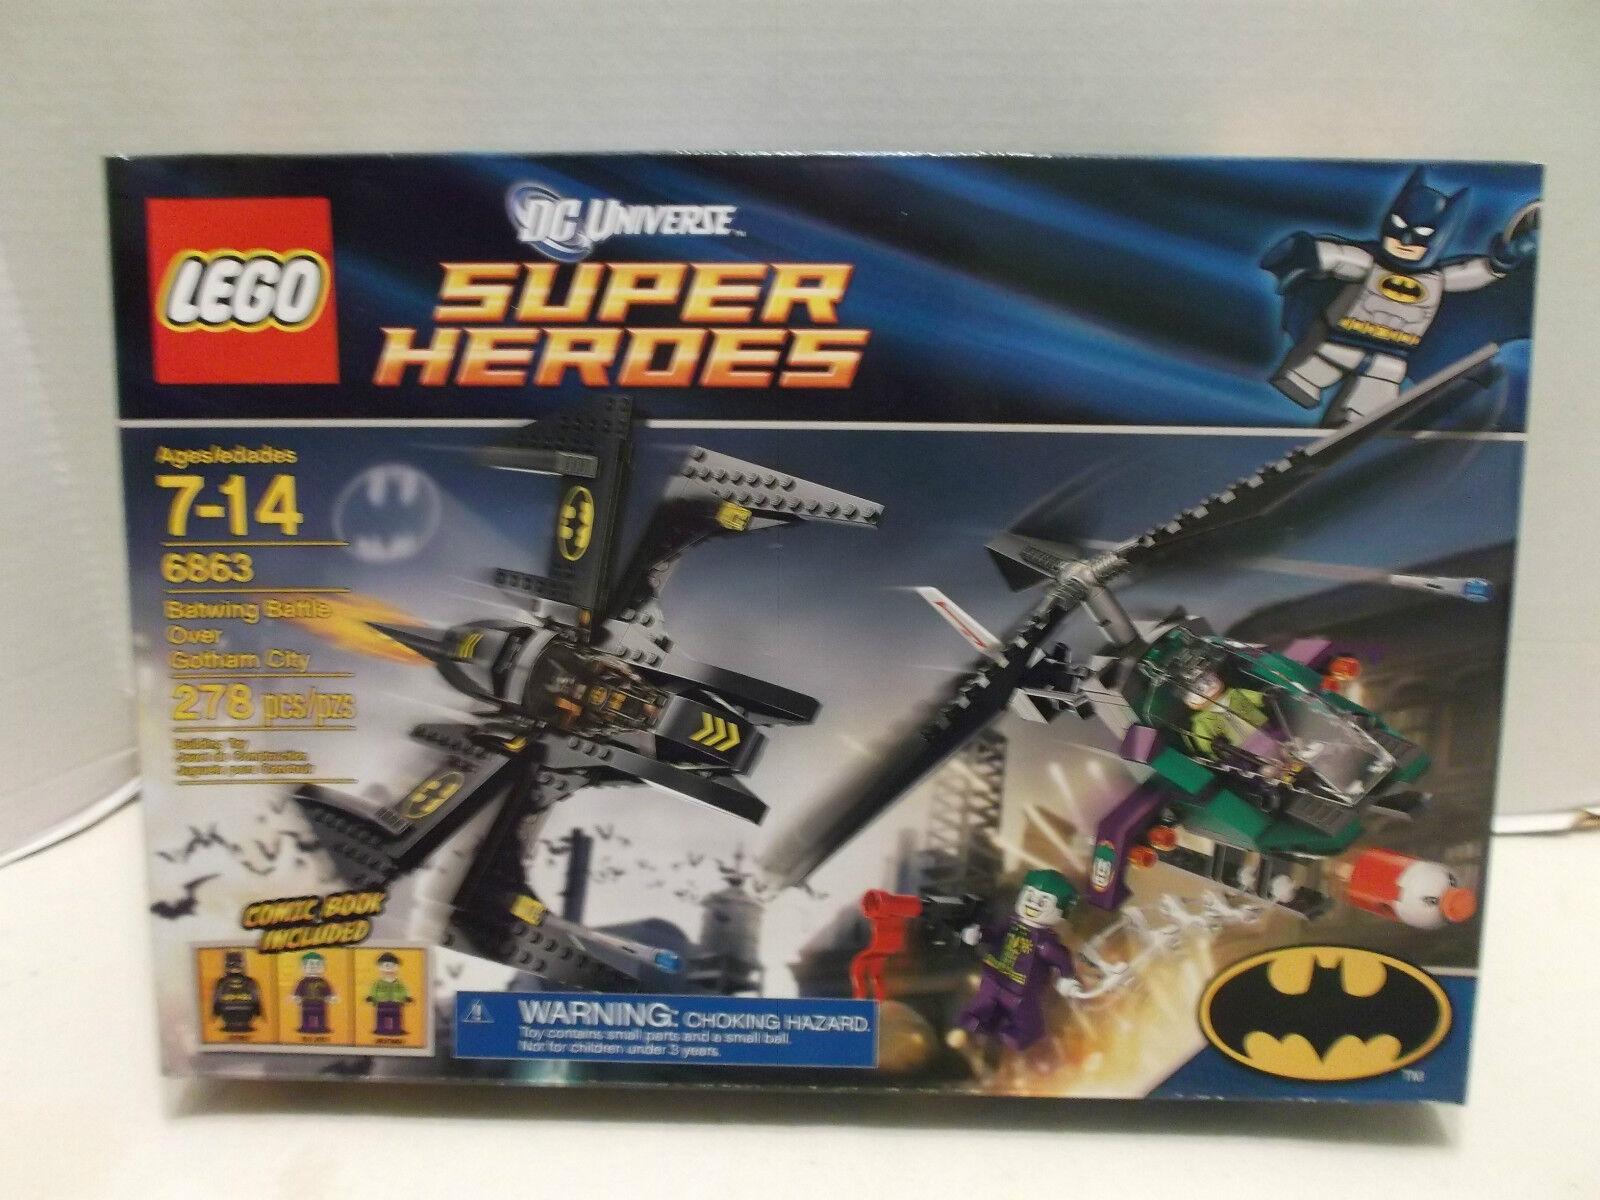 Lego  6863 Batwing Battle Over Gotham City DC Univ. Super Heroes RHTF NIB 2012